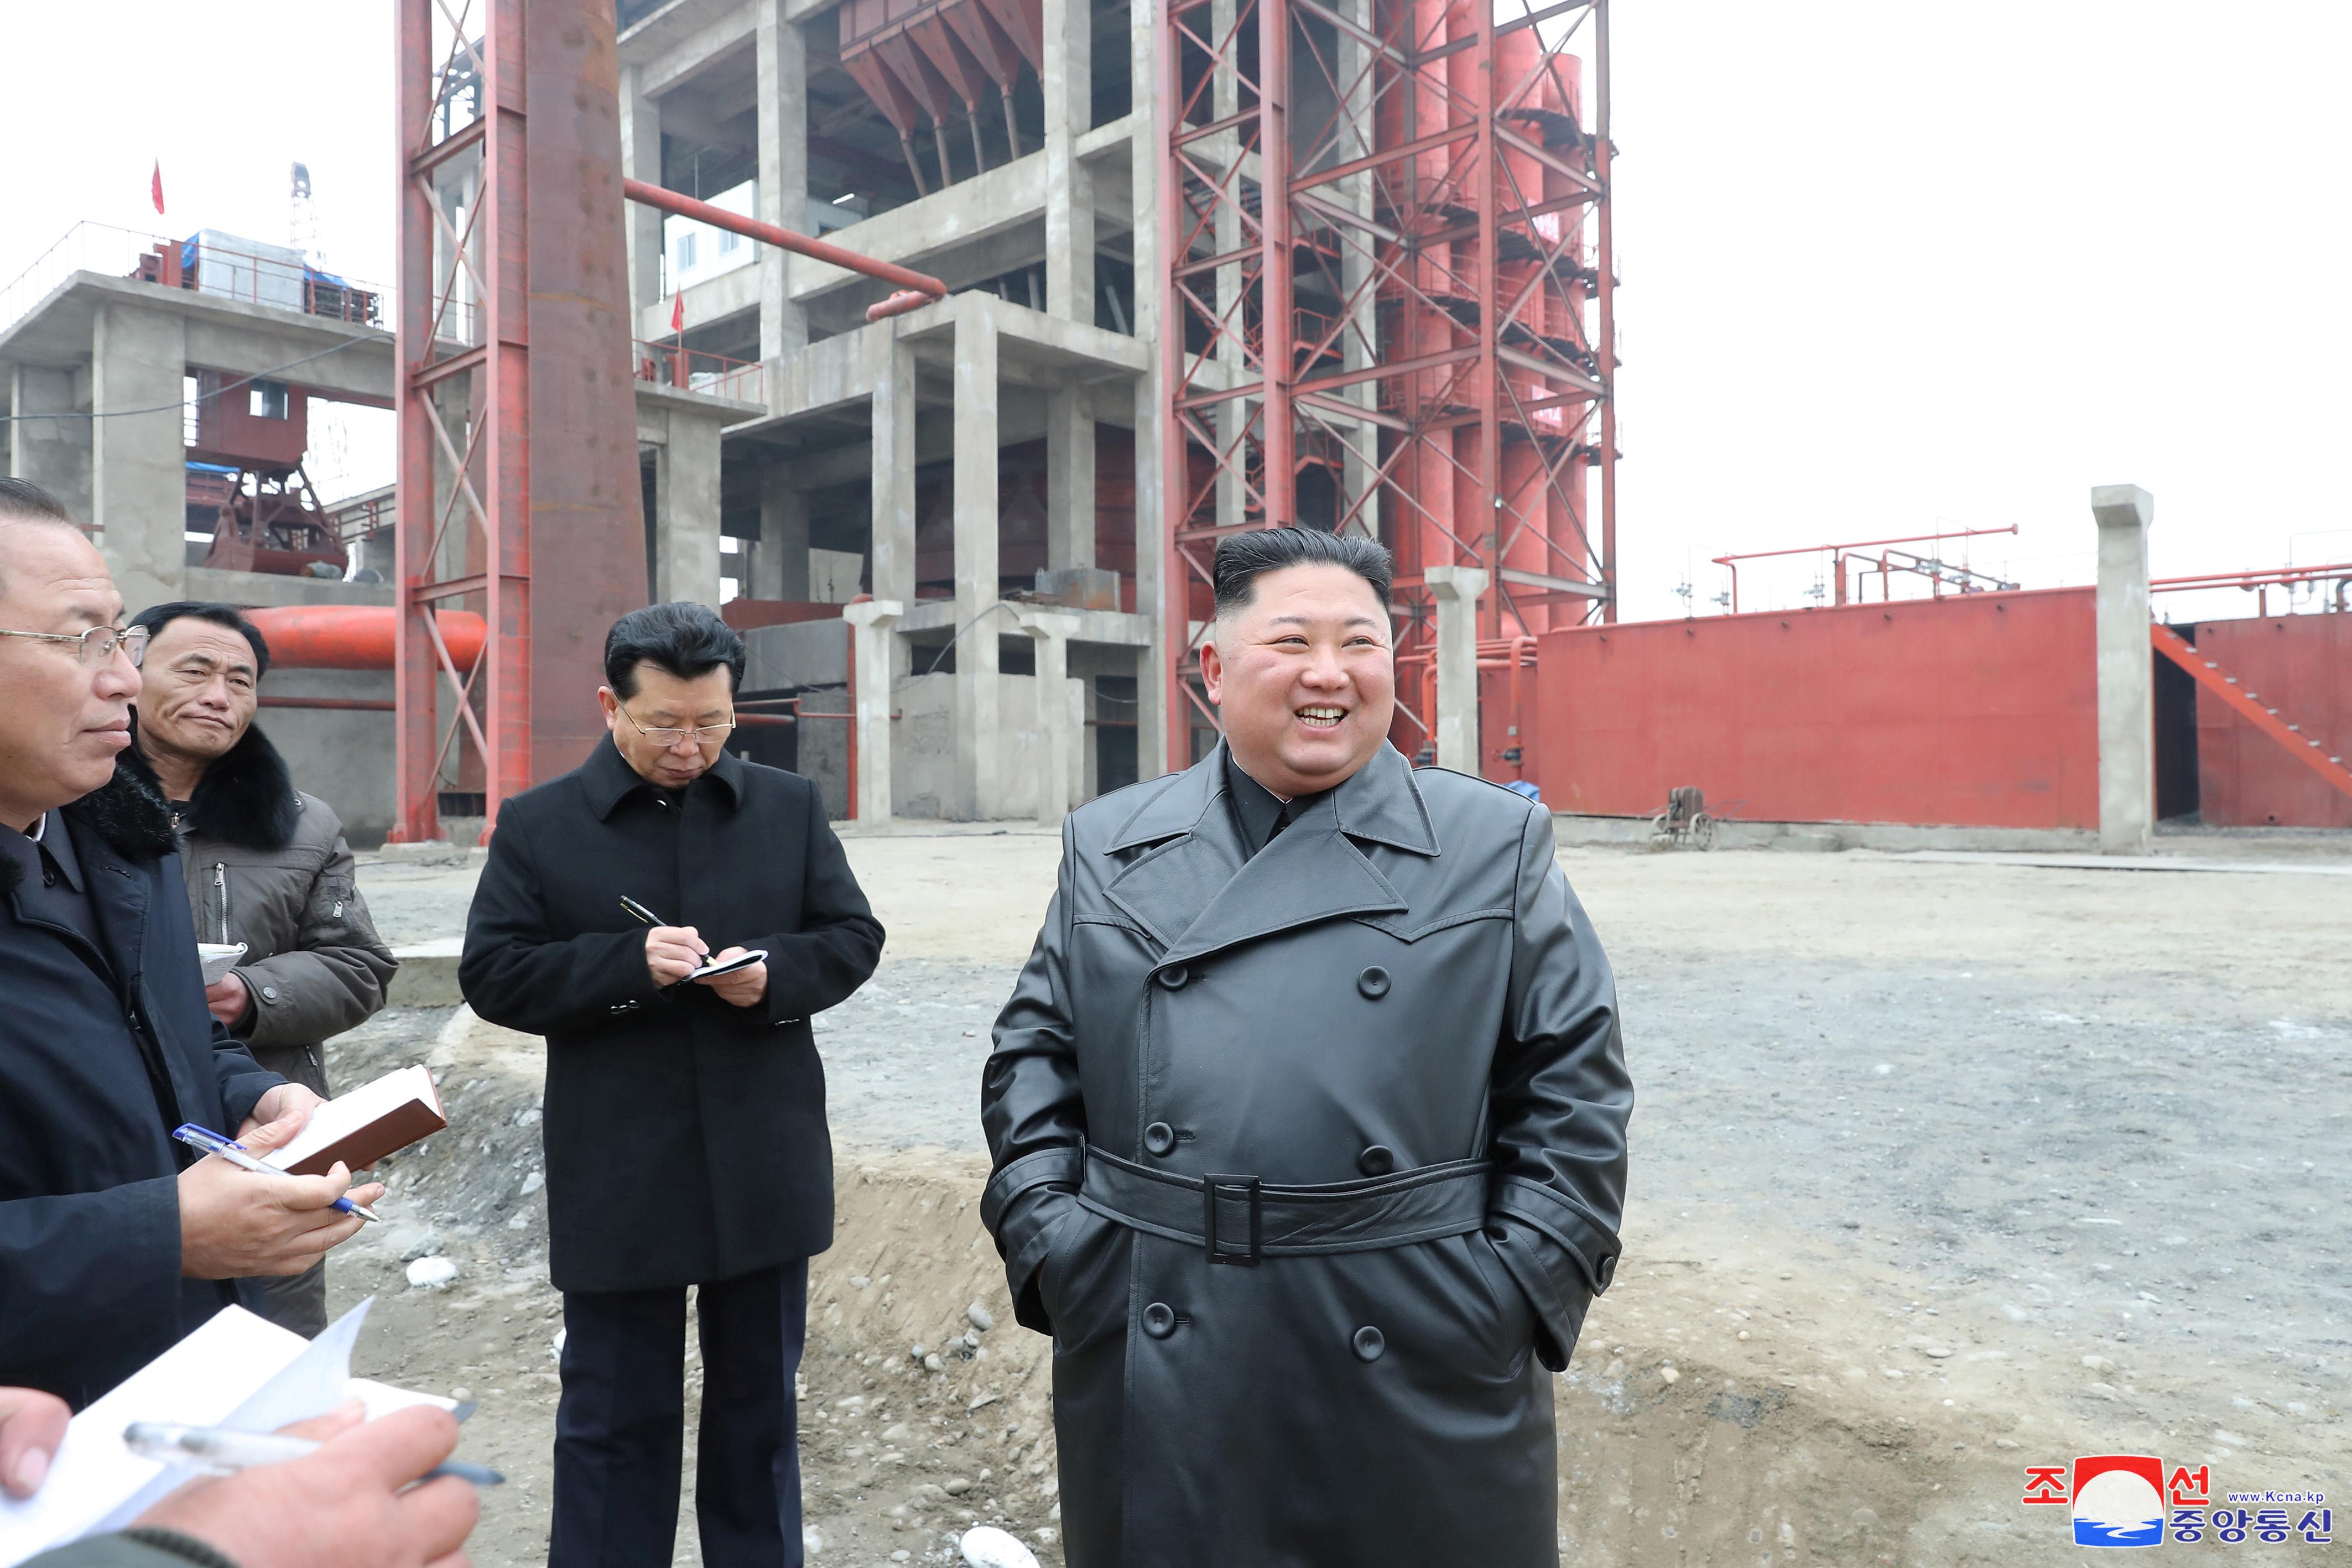 North Korean Leaders Aunt Re-Emerges After Husbands Execution